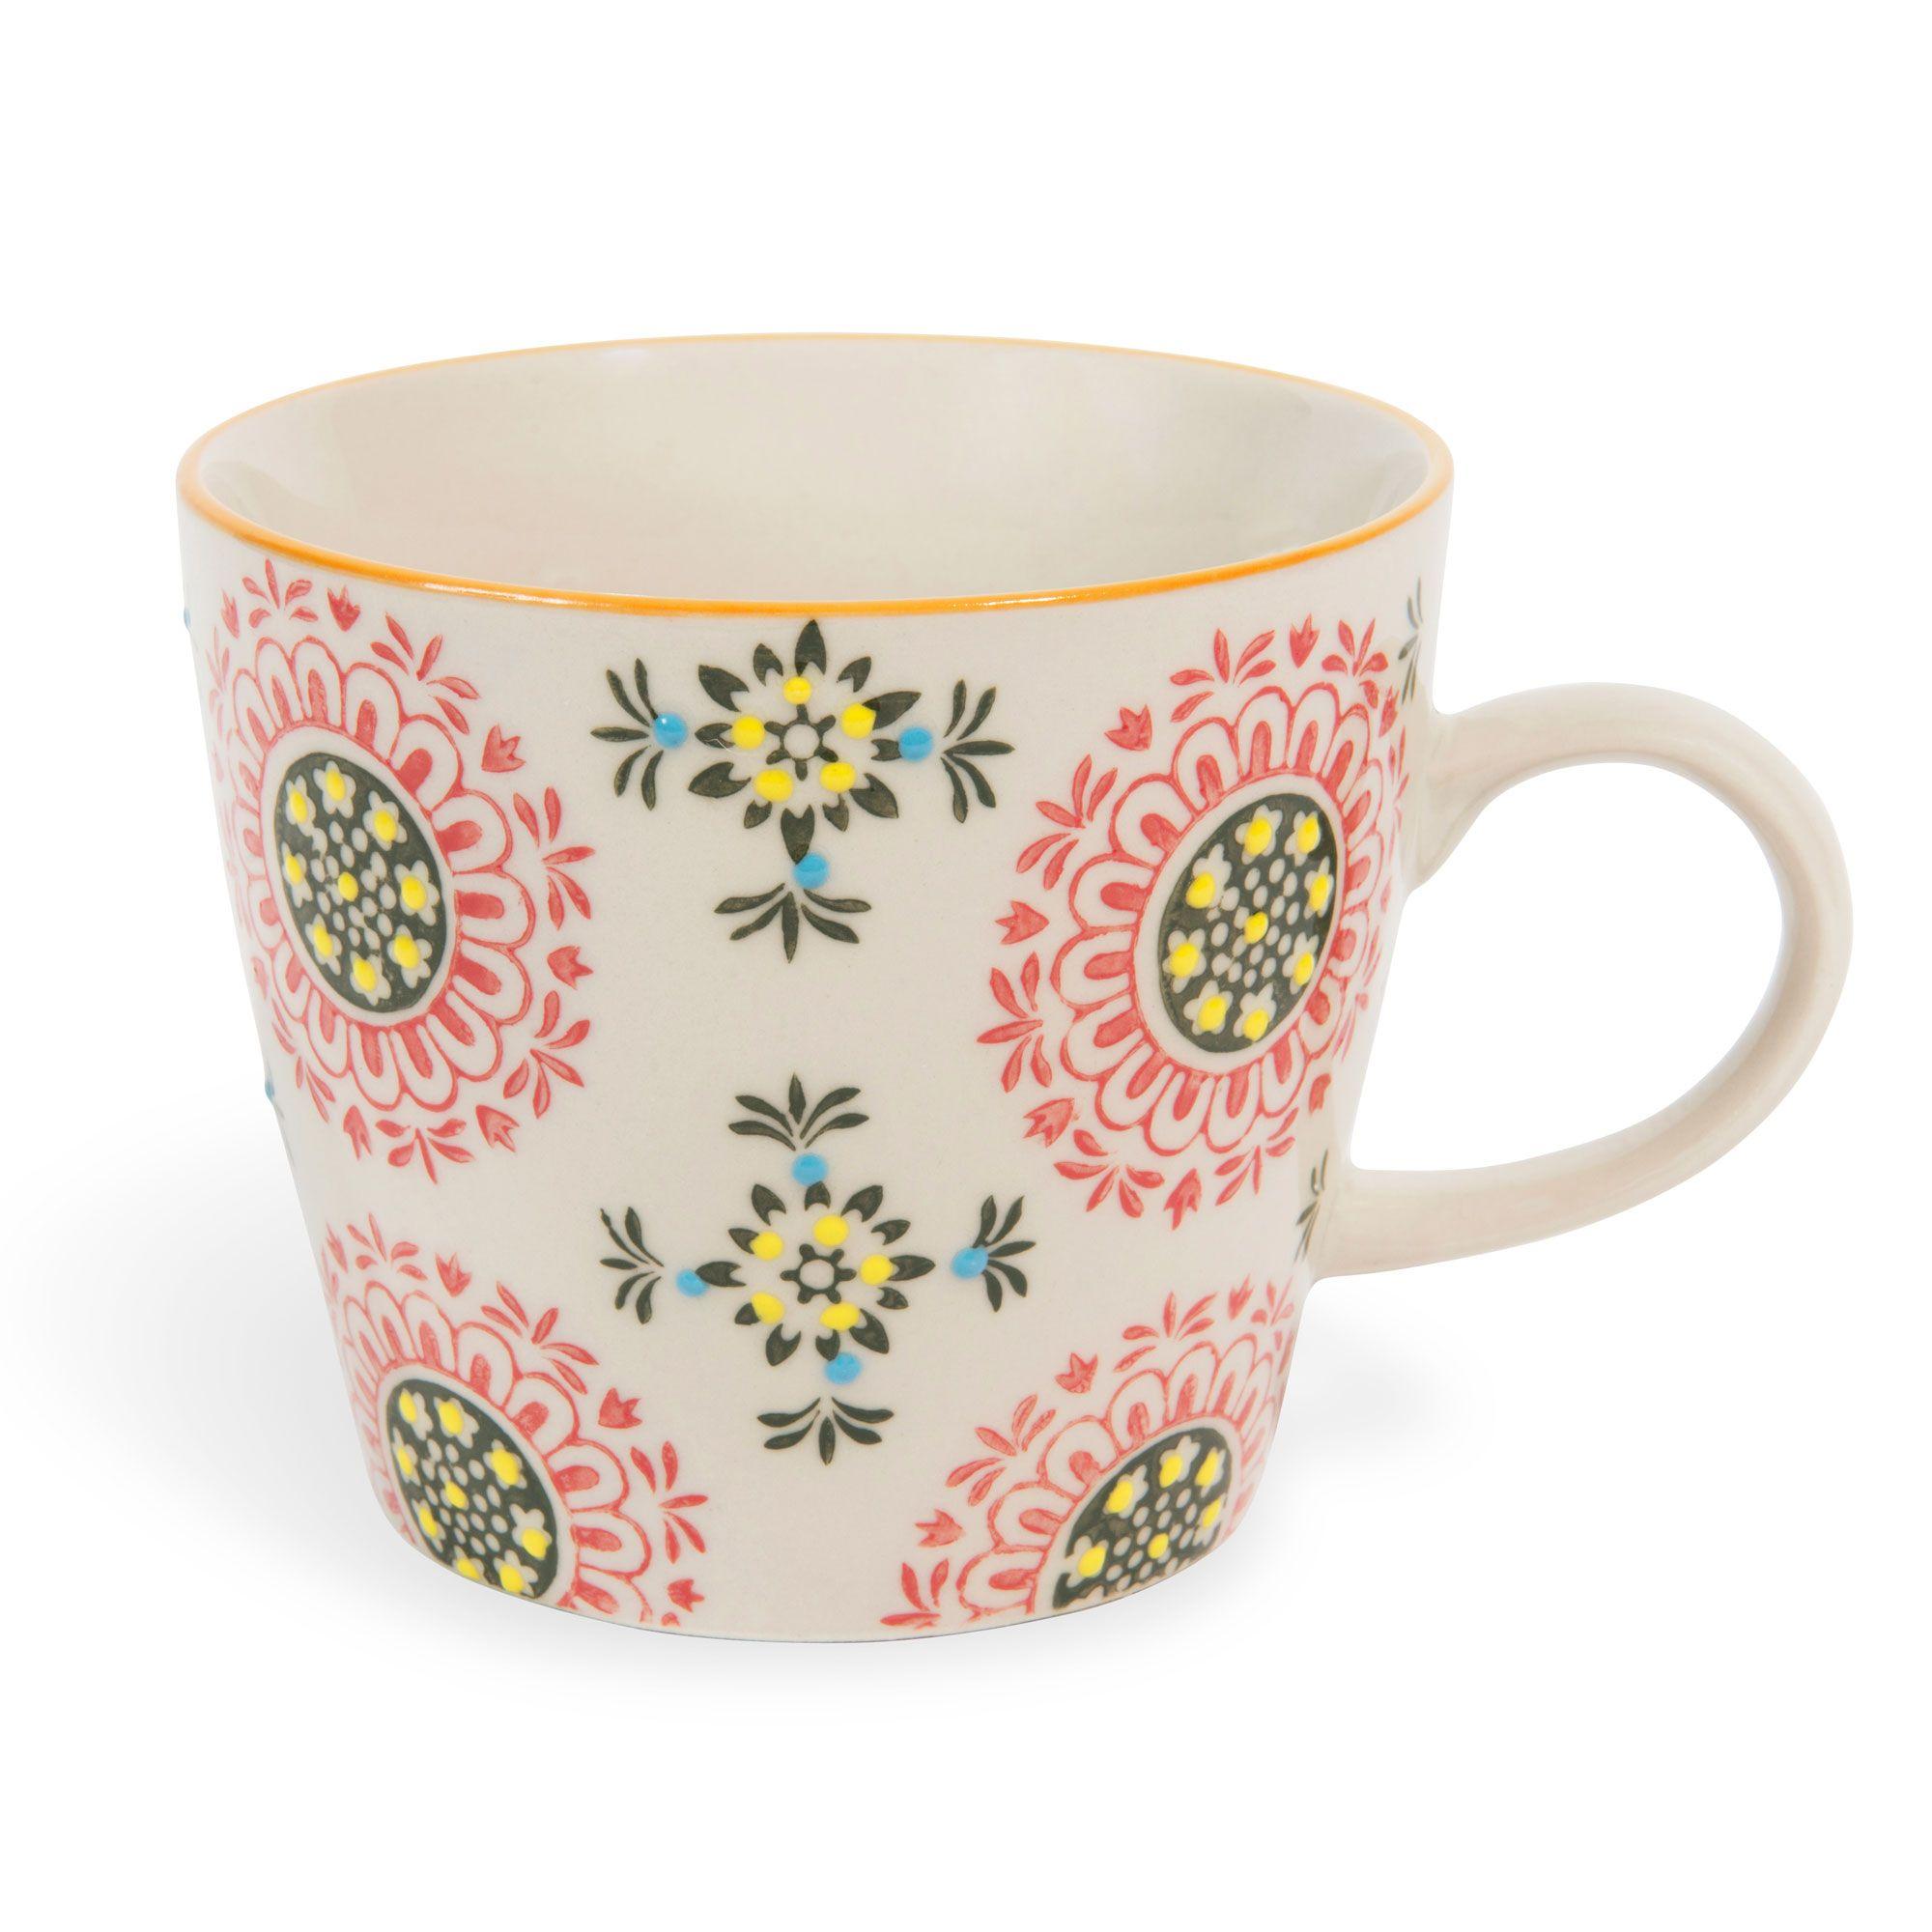 maison du monde tazze mug ventana blog. Black Bedroom Furniture Sets. Home Design Ideas